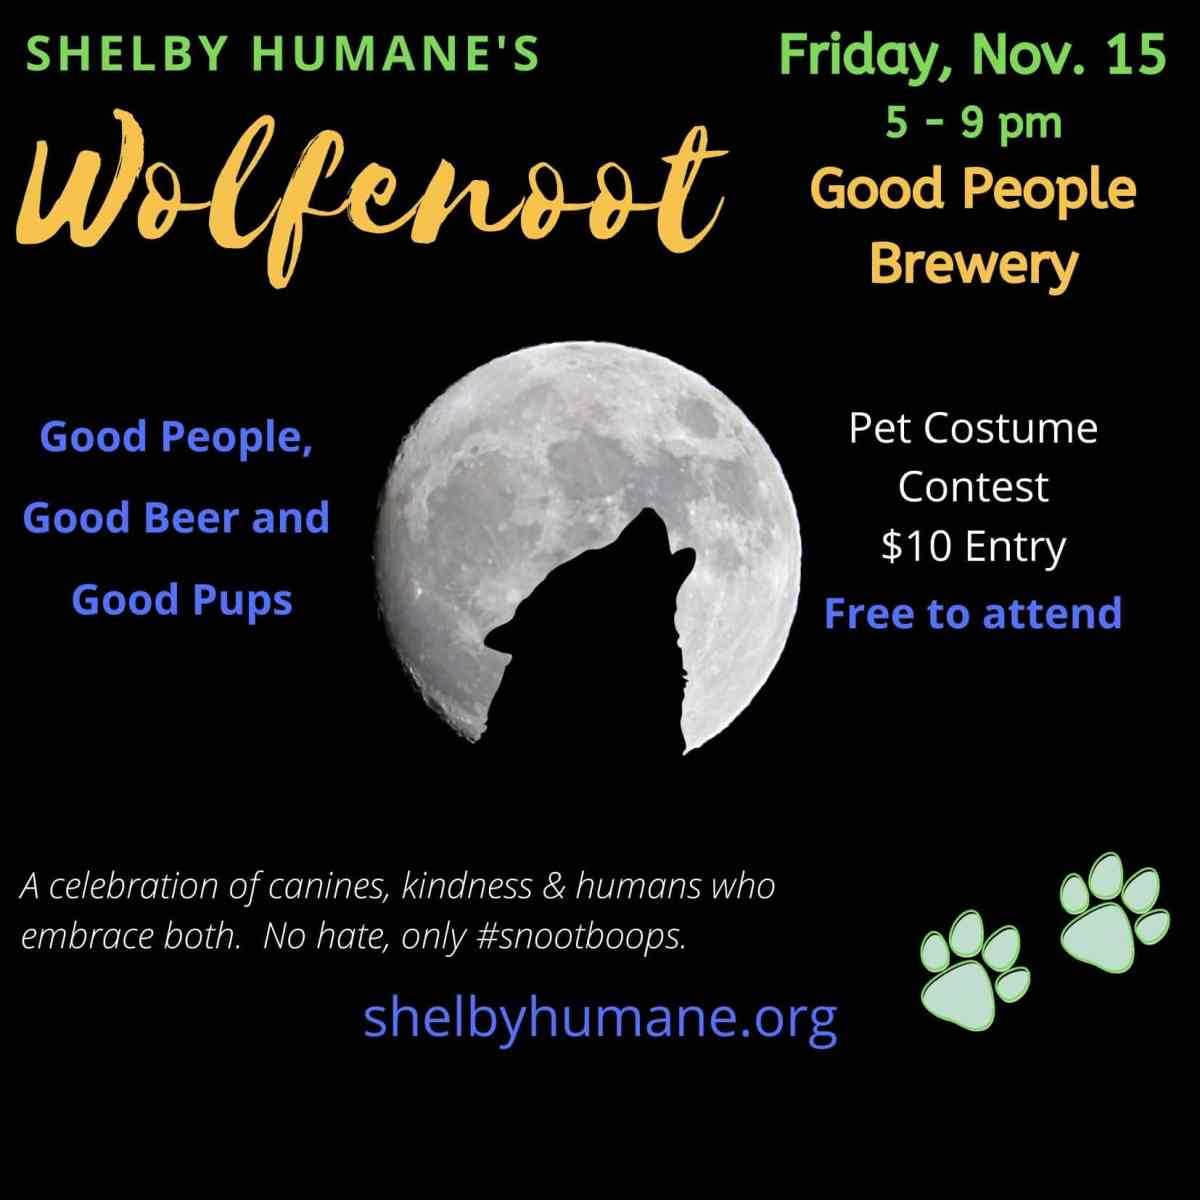 Shelby Humane's Wolfenoot